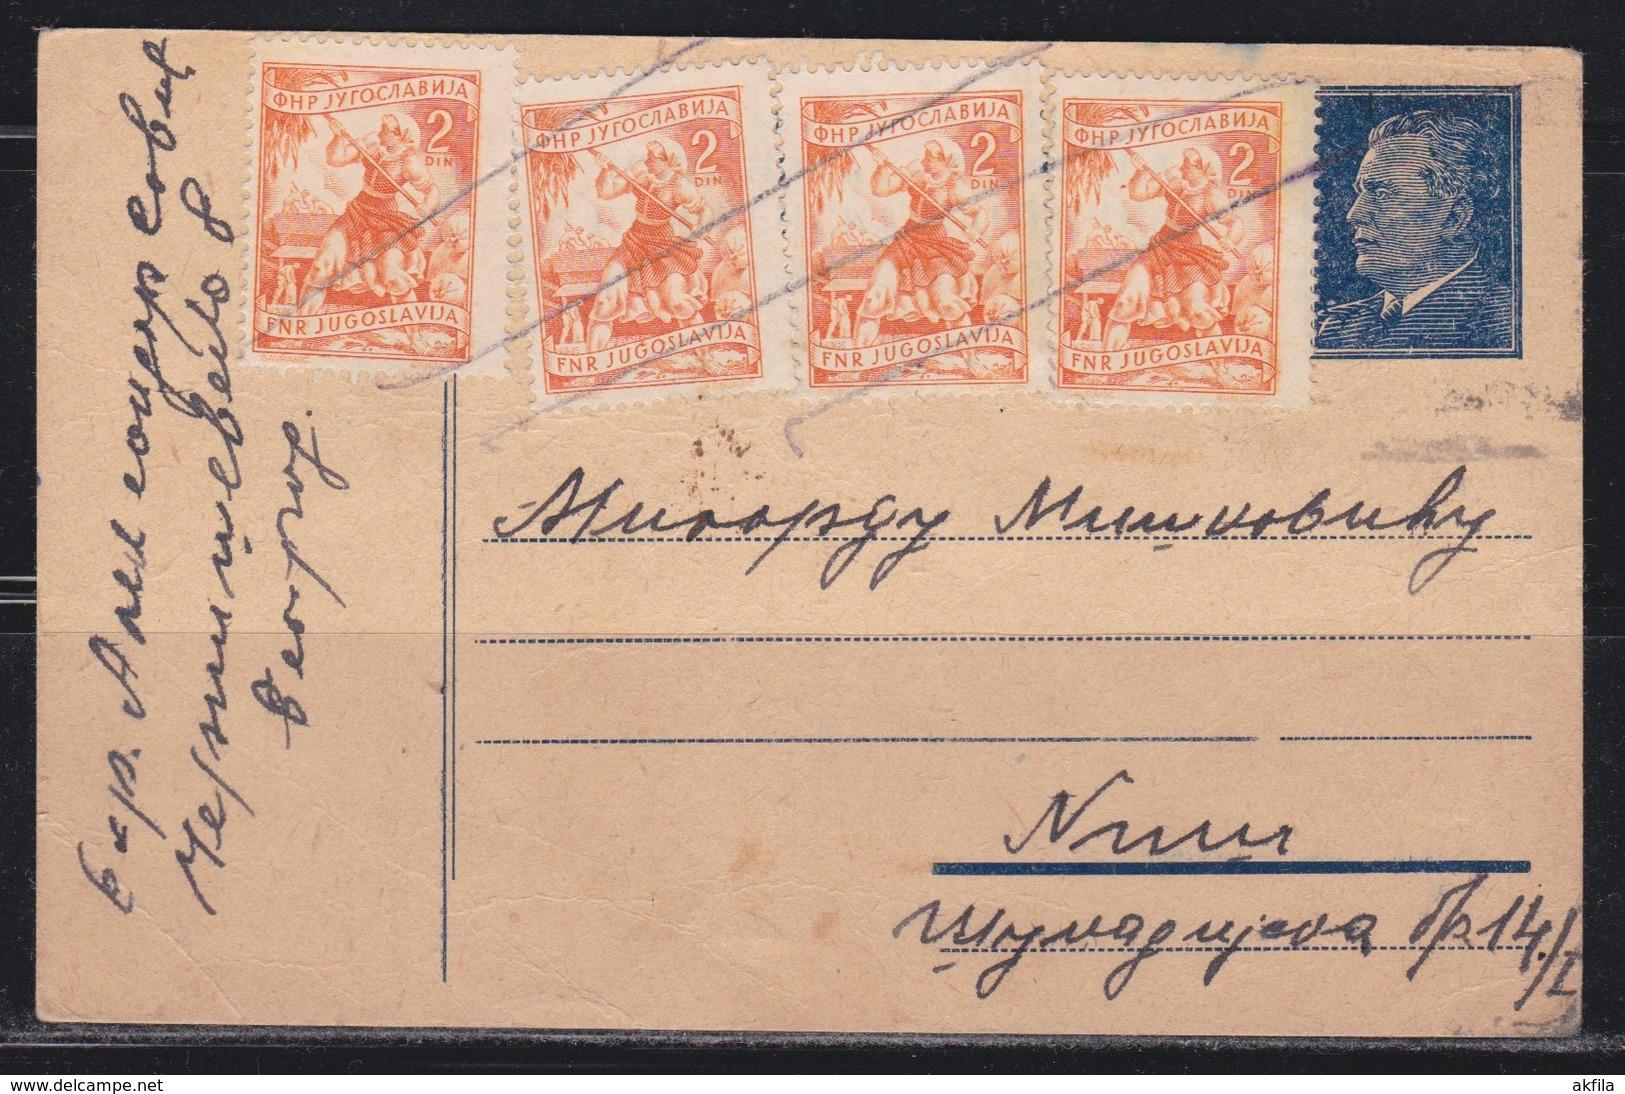 Yugoslavia 1951 Marshal Tito Postal Stationery Beograd-Nis - Ganzsachen